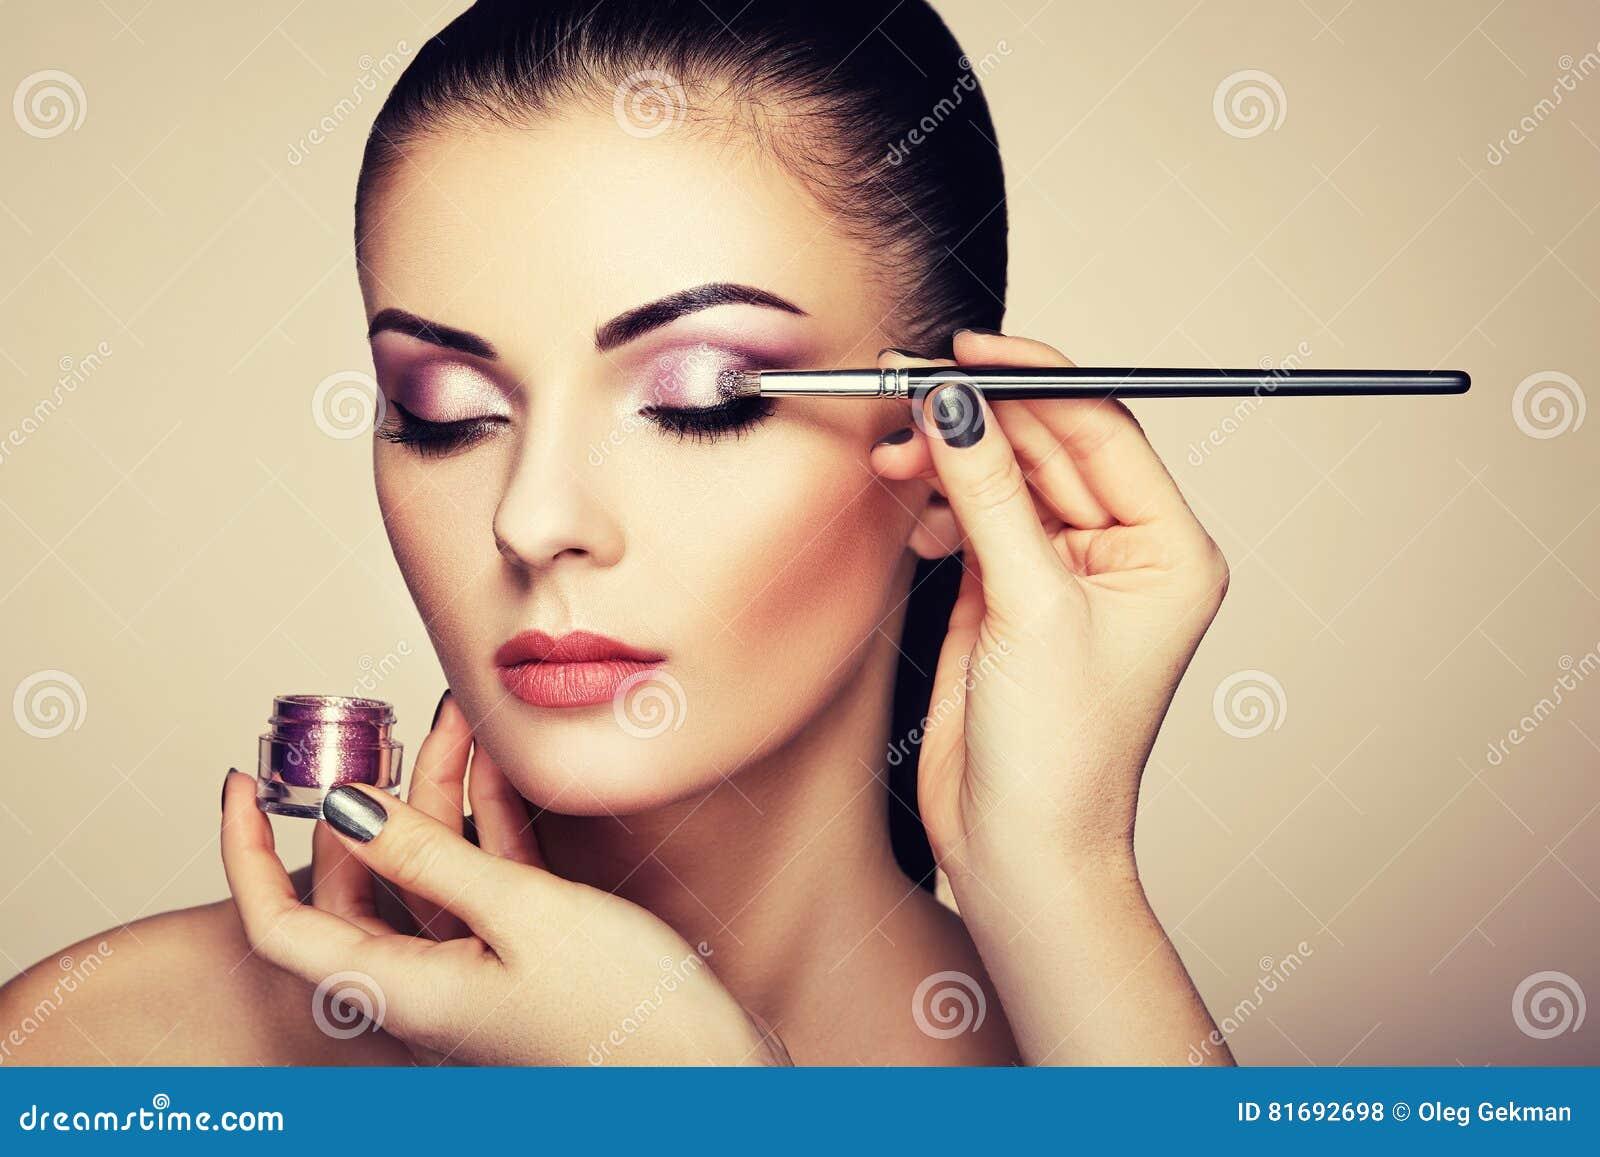 Makeup Artist Applies Eye Shadow Stock Photo - Image of